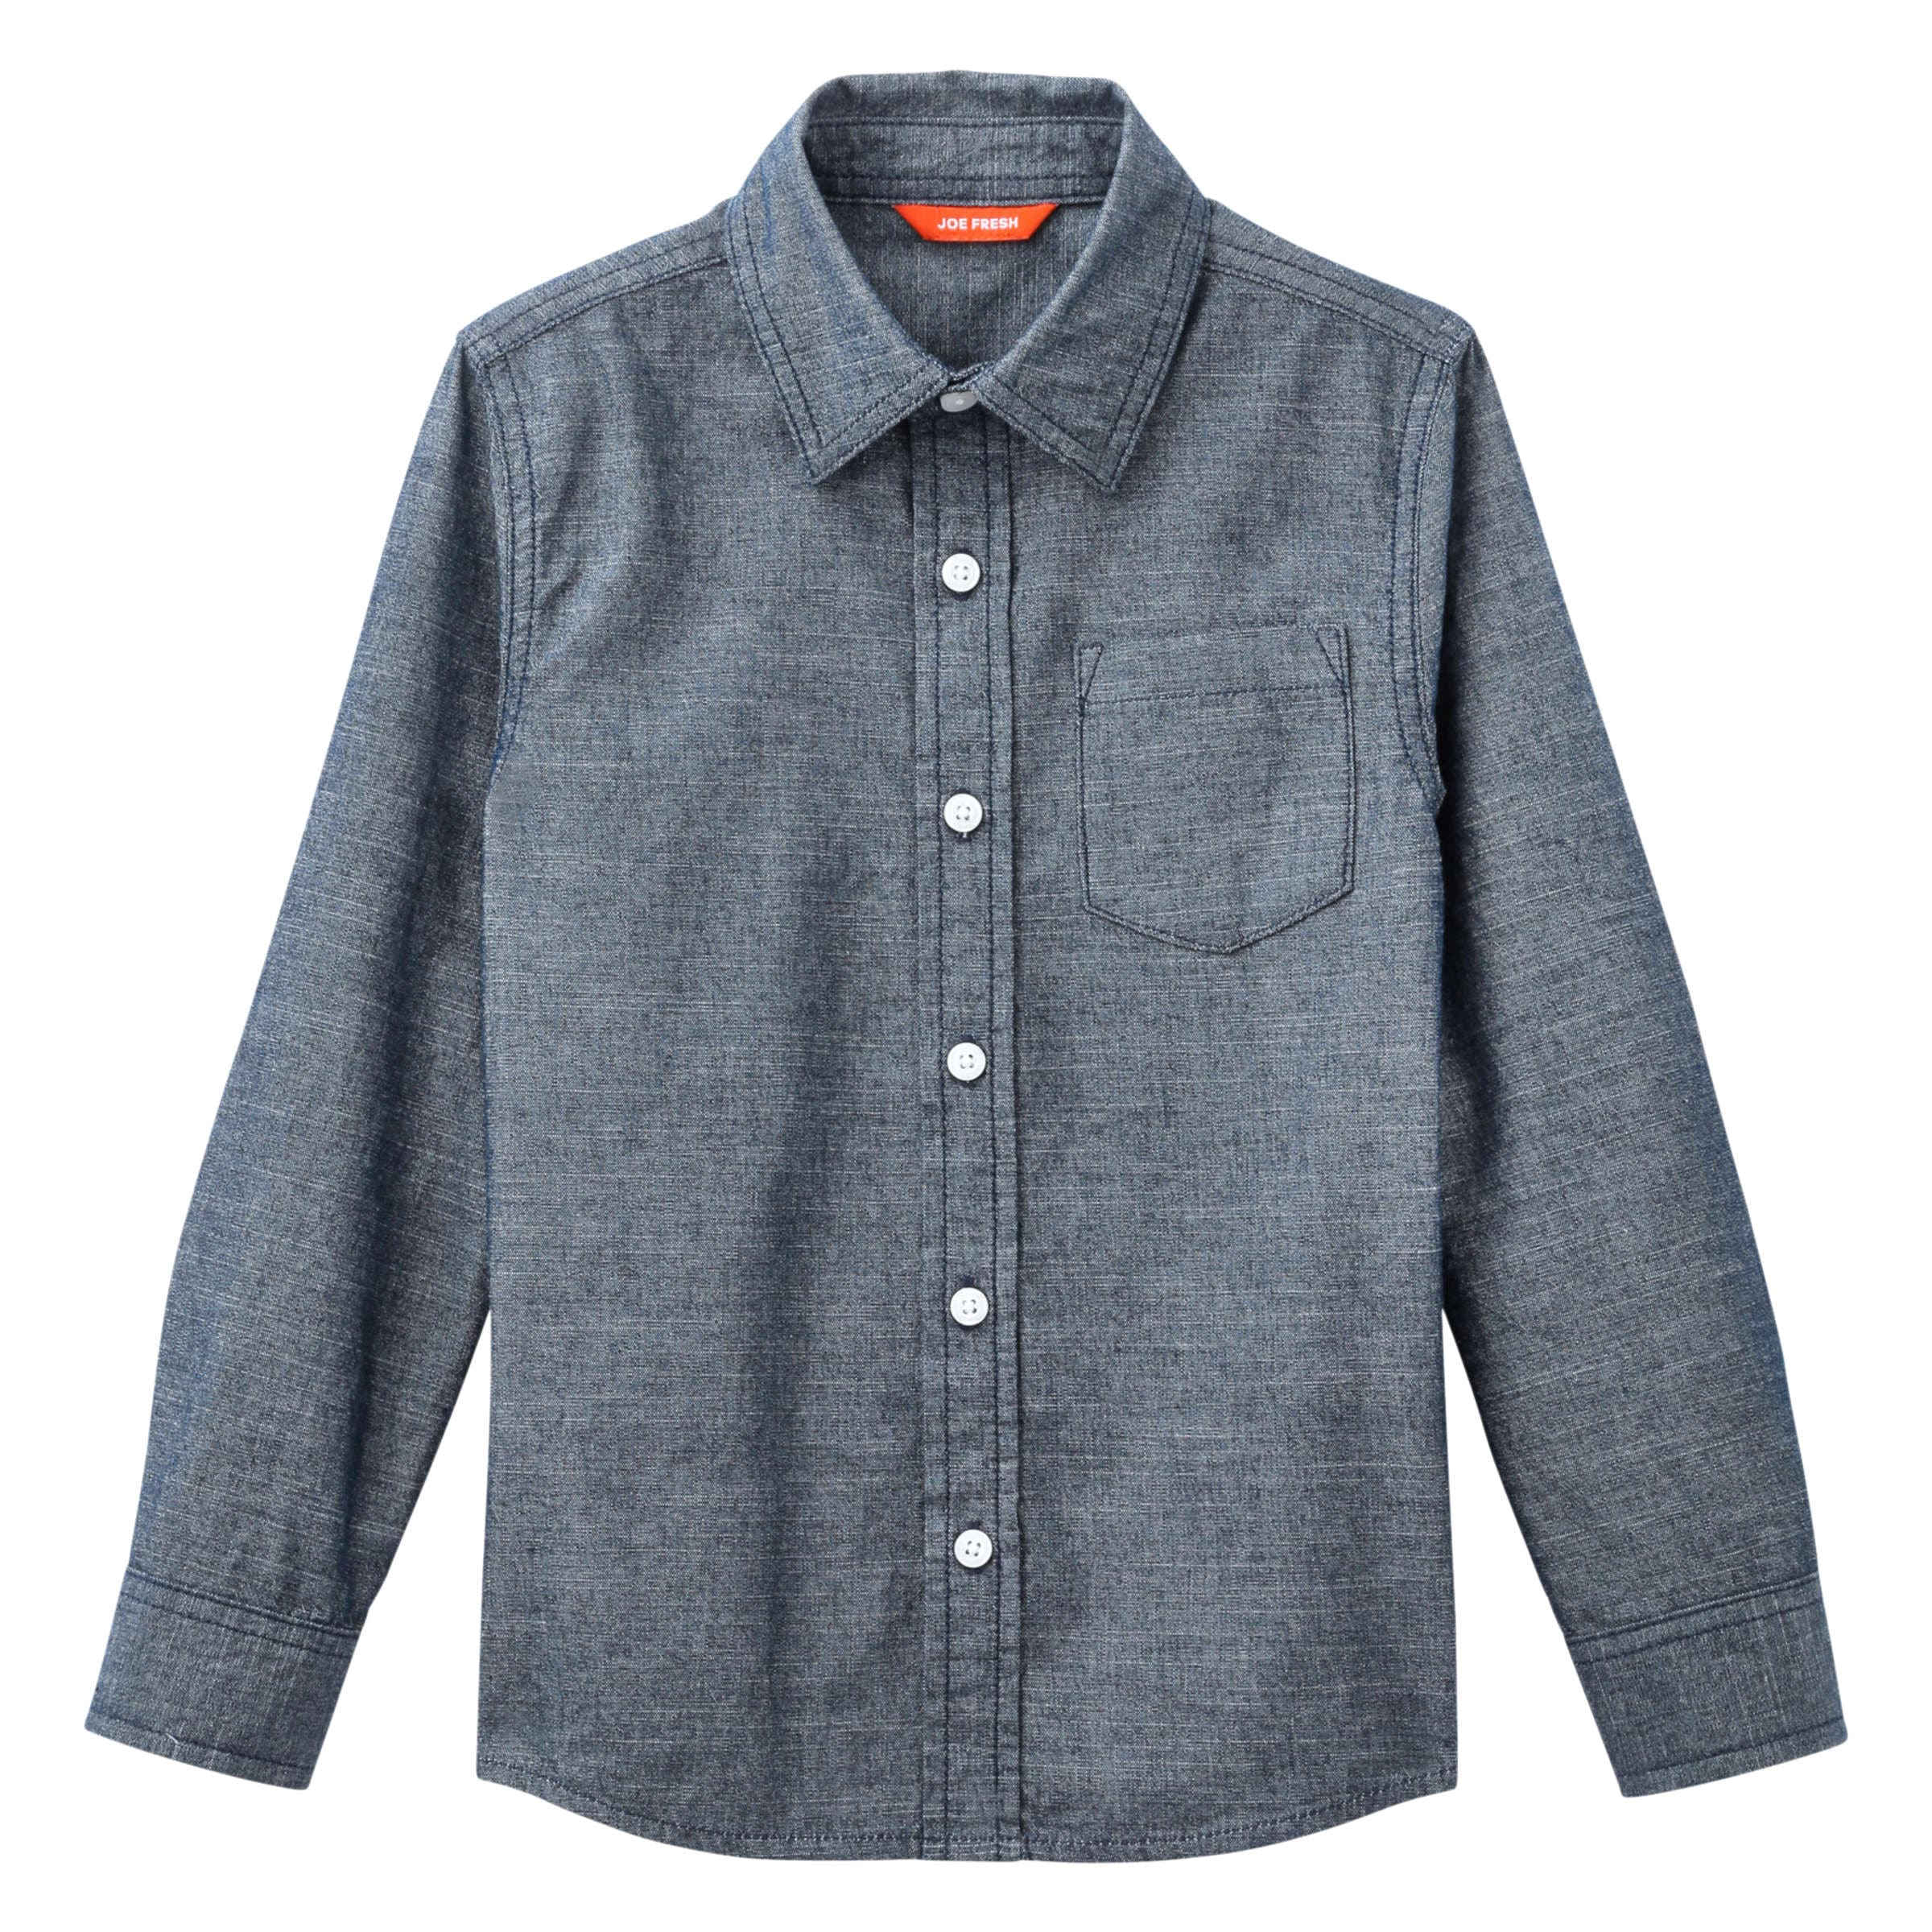 9735f211b Kid Boys' Chambray Shirt in Blue from Joe Fresh